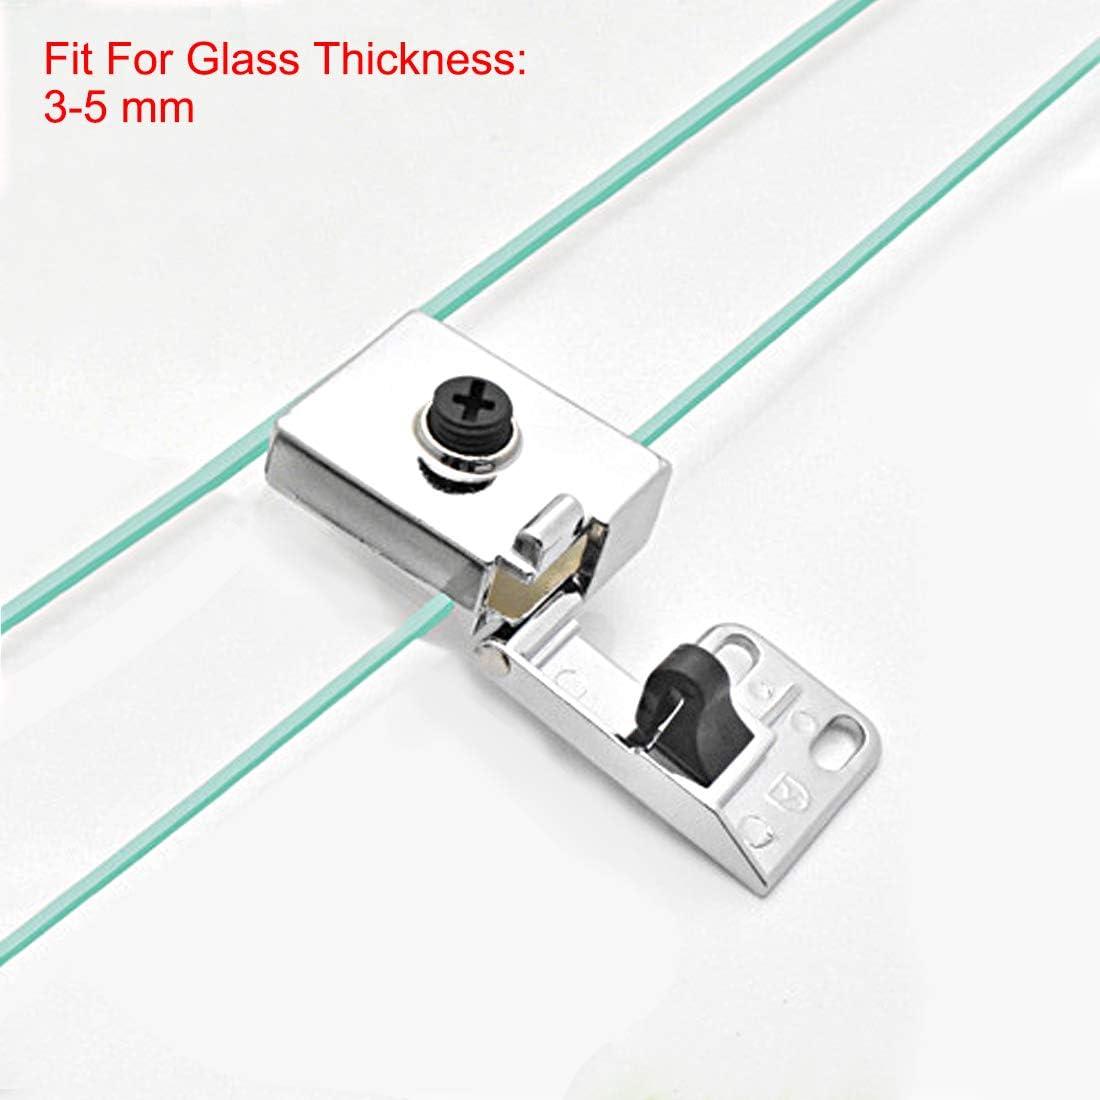 sourcing map Bisagra abrazadera para cristal vidrio de alacena armario puerta vitrina de 3-5 mm de grosor 1PAR